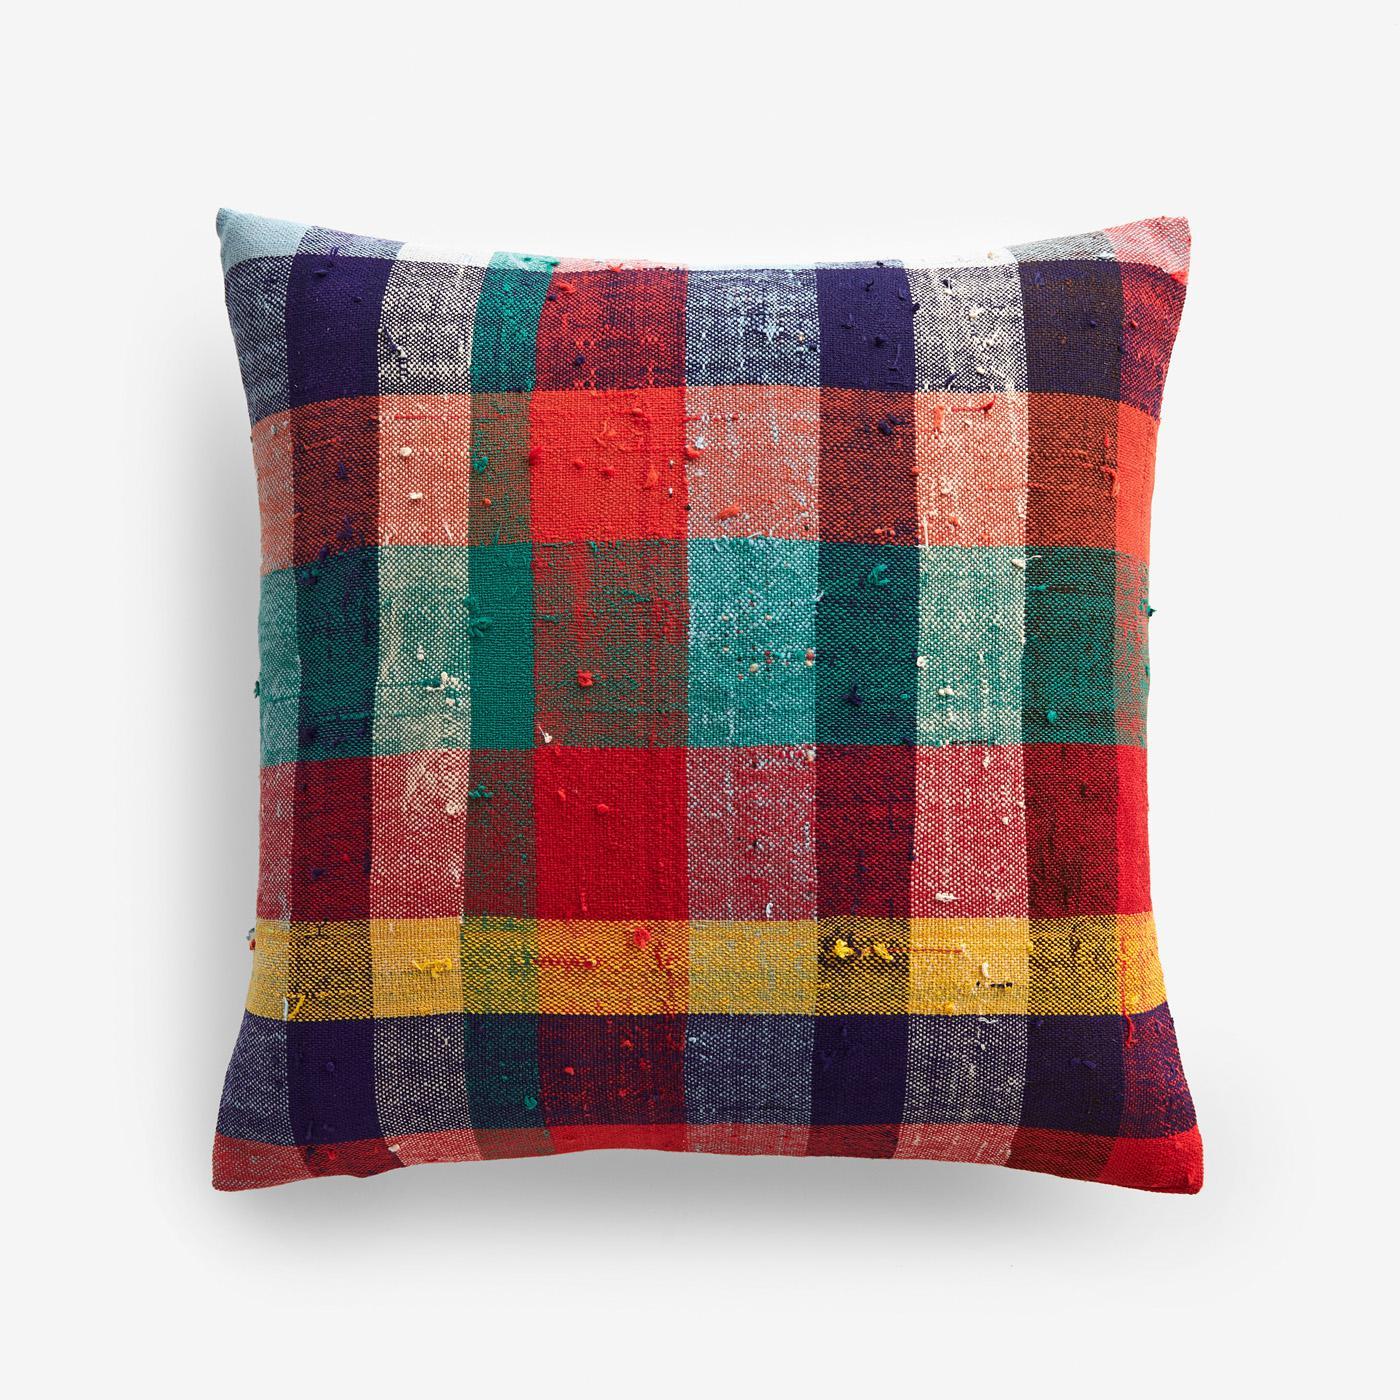 stuart plaid throw pillow cover 17 x 17